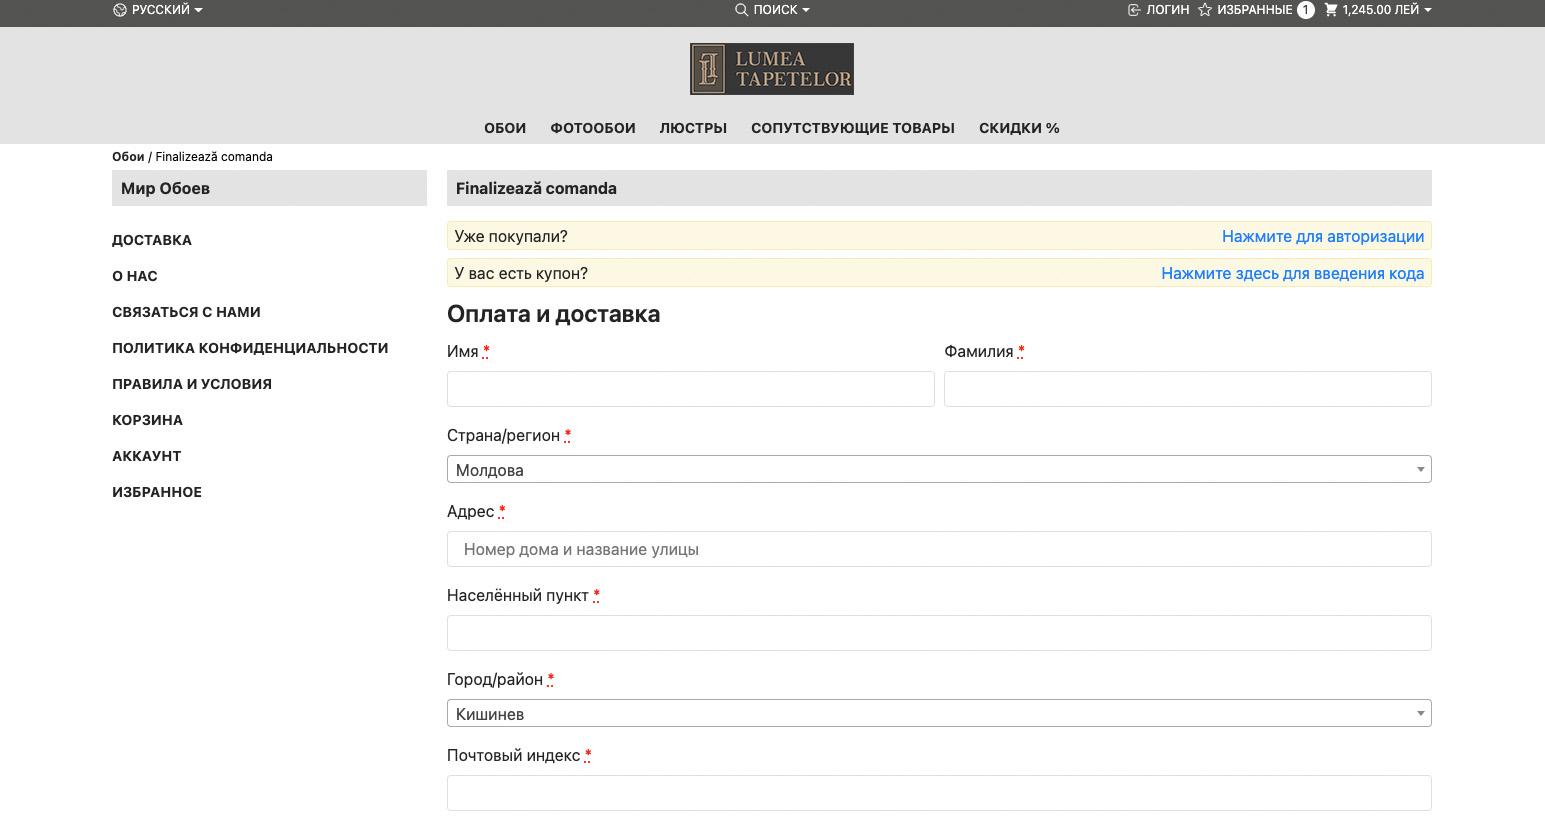 Redesign of Lumea Tapetelor 23 online store